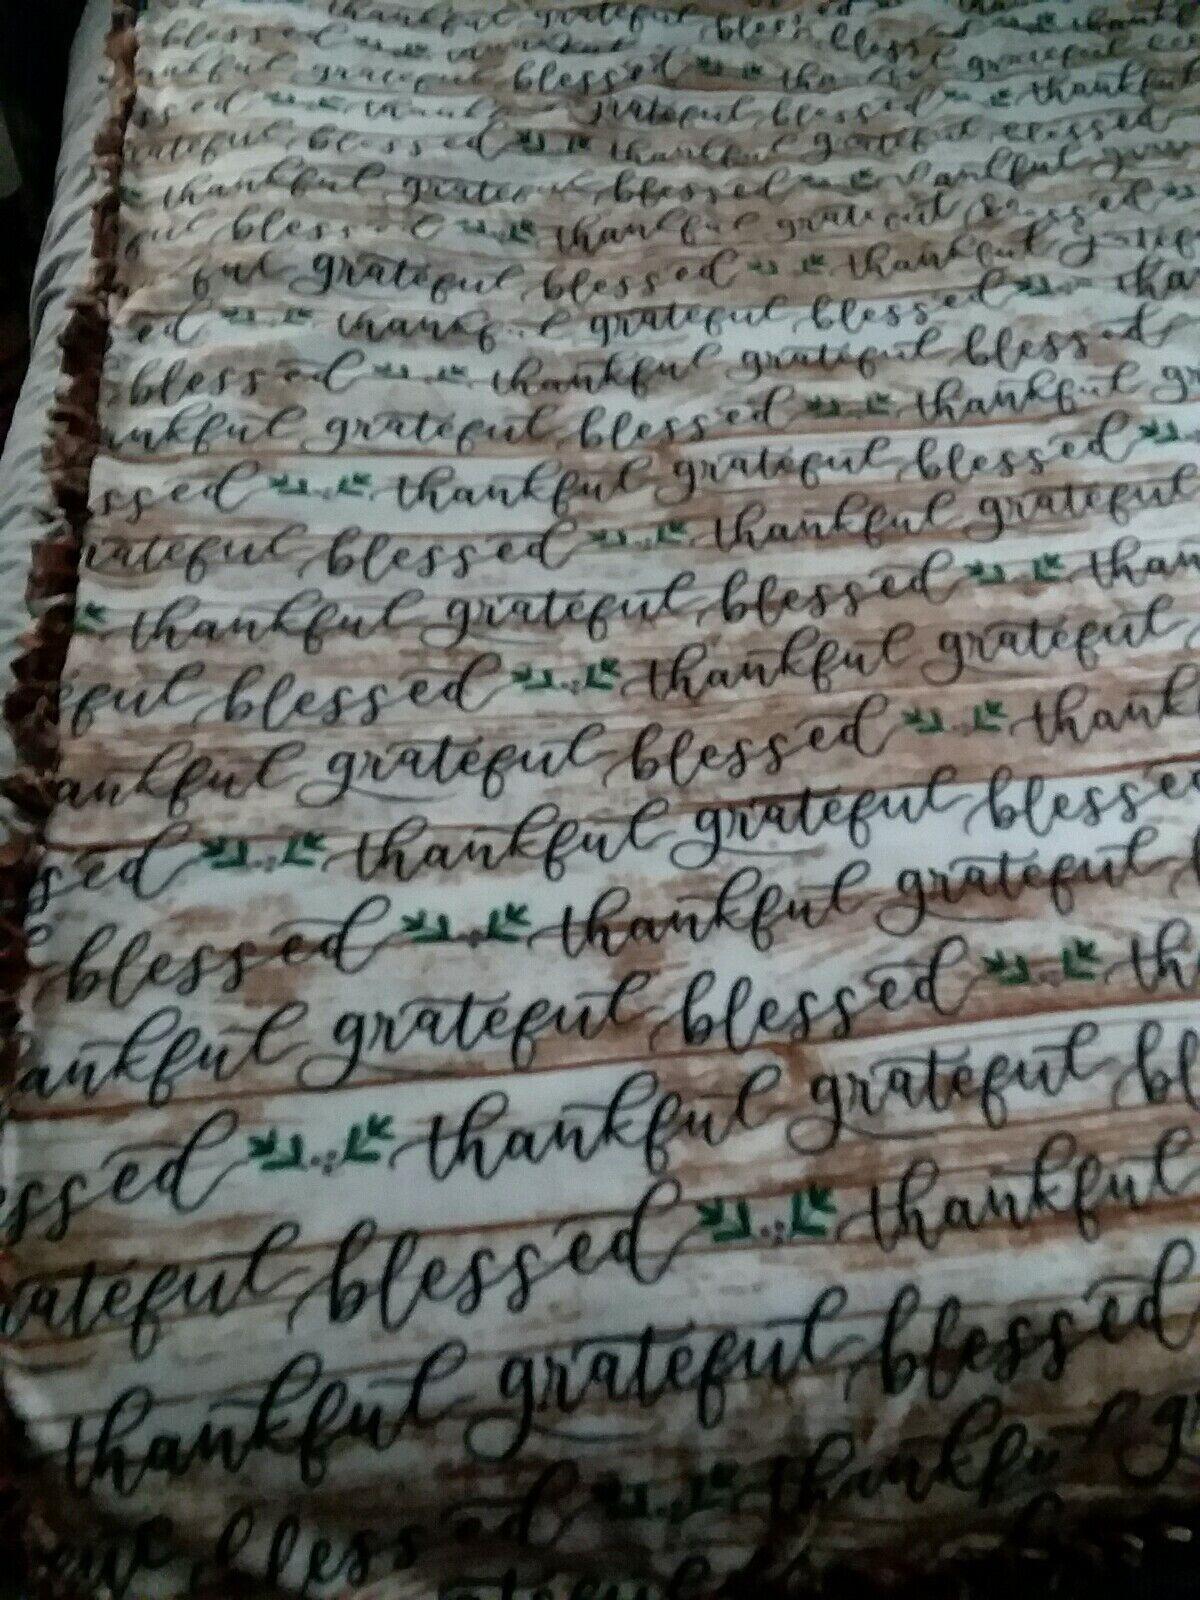 Fleece Handmade Tie Blanket LARGE 60 X94  Lodge Blessed Thankful Wood Log